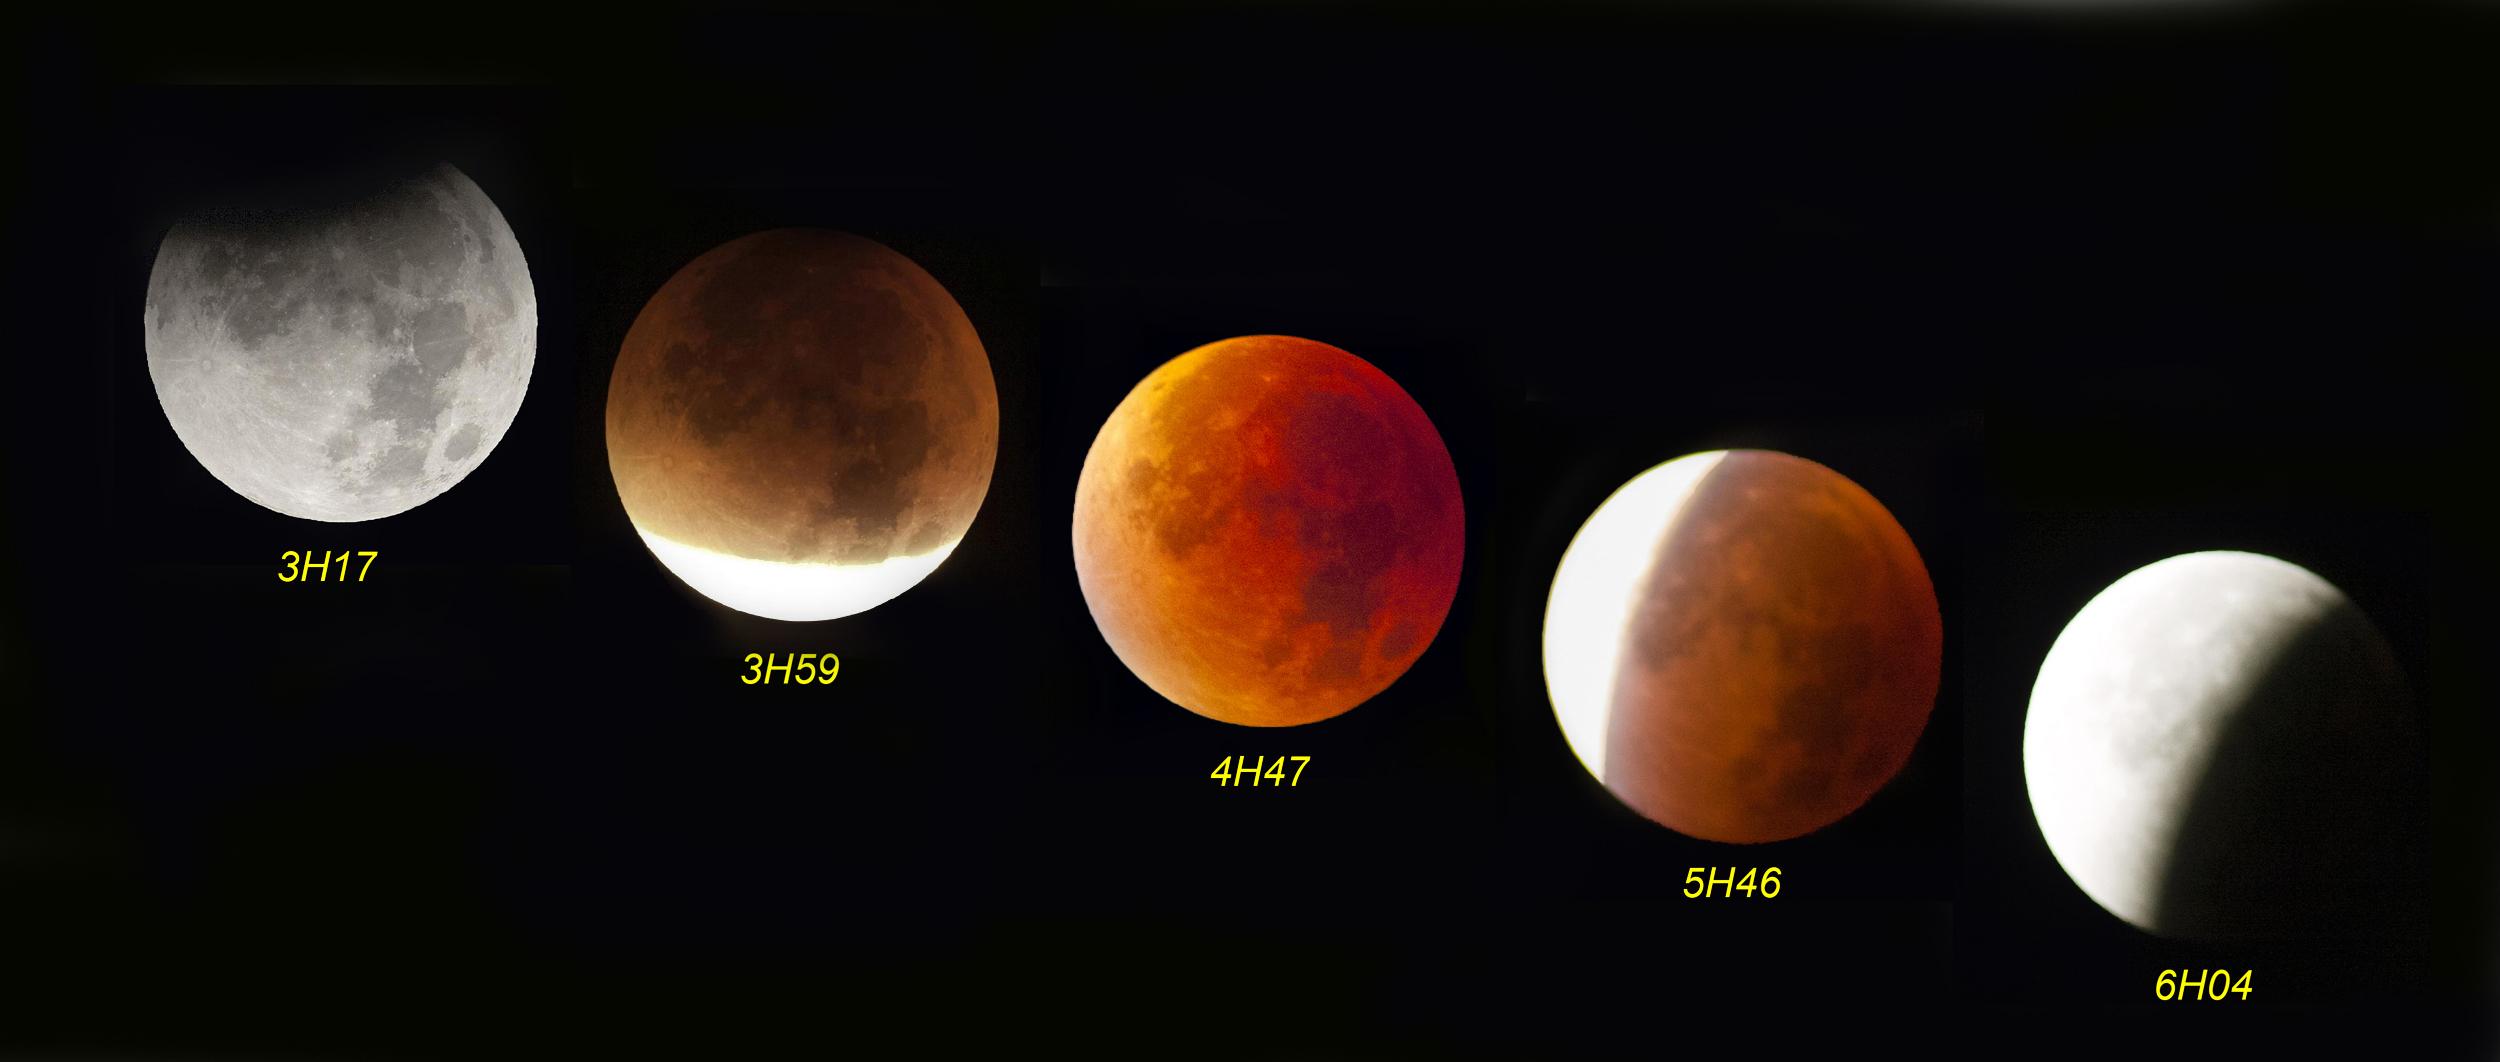 EclipseLunephotomontage